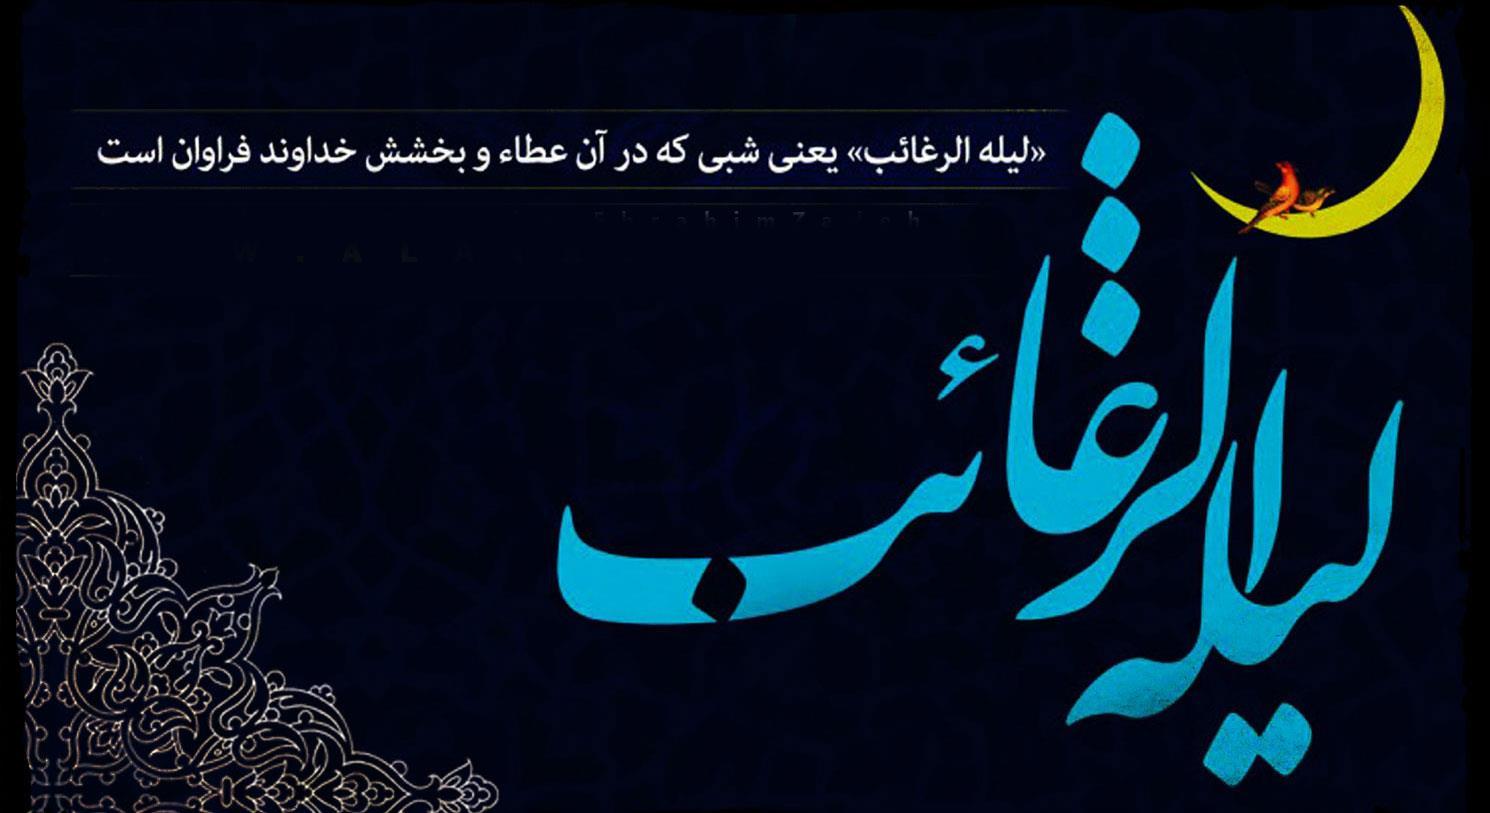 اعمال لیله الرغائب و فضیلت شب آرزوها